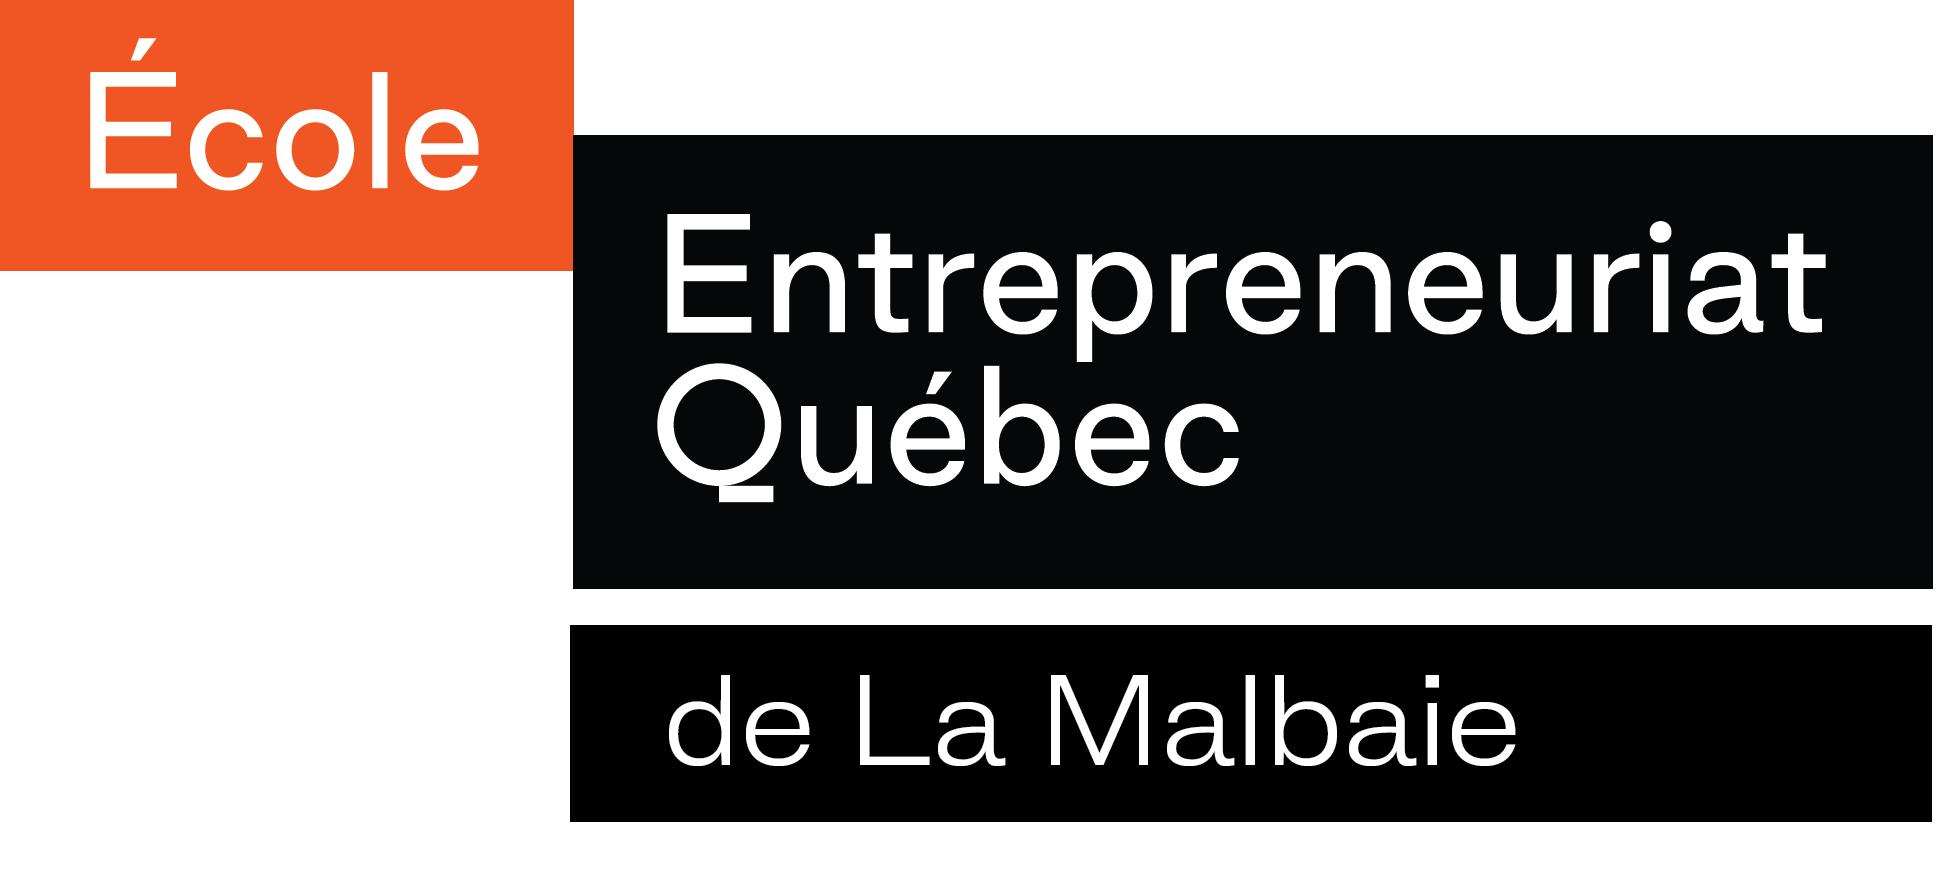 EQ_Logo de La Malbaie.png